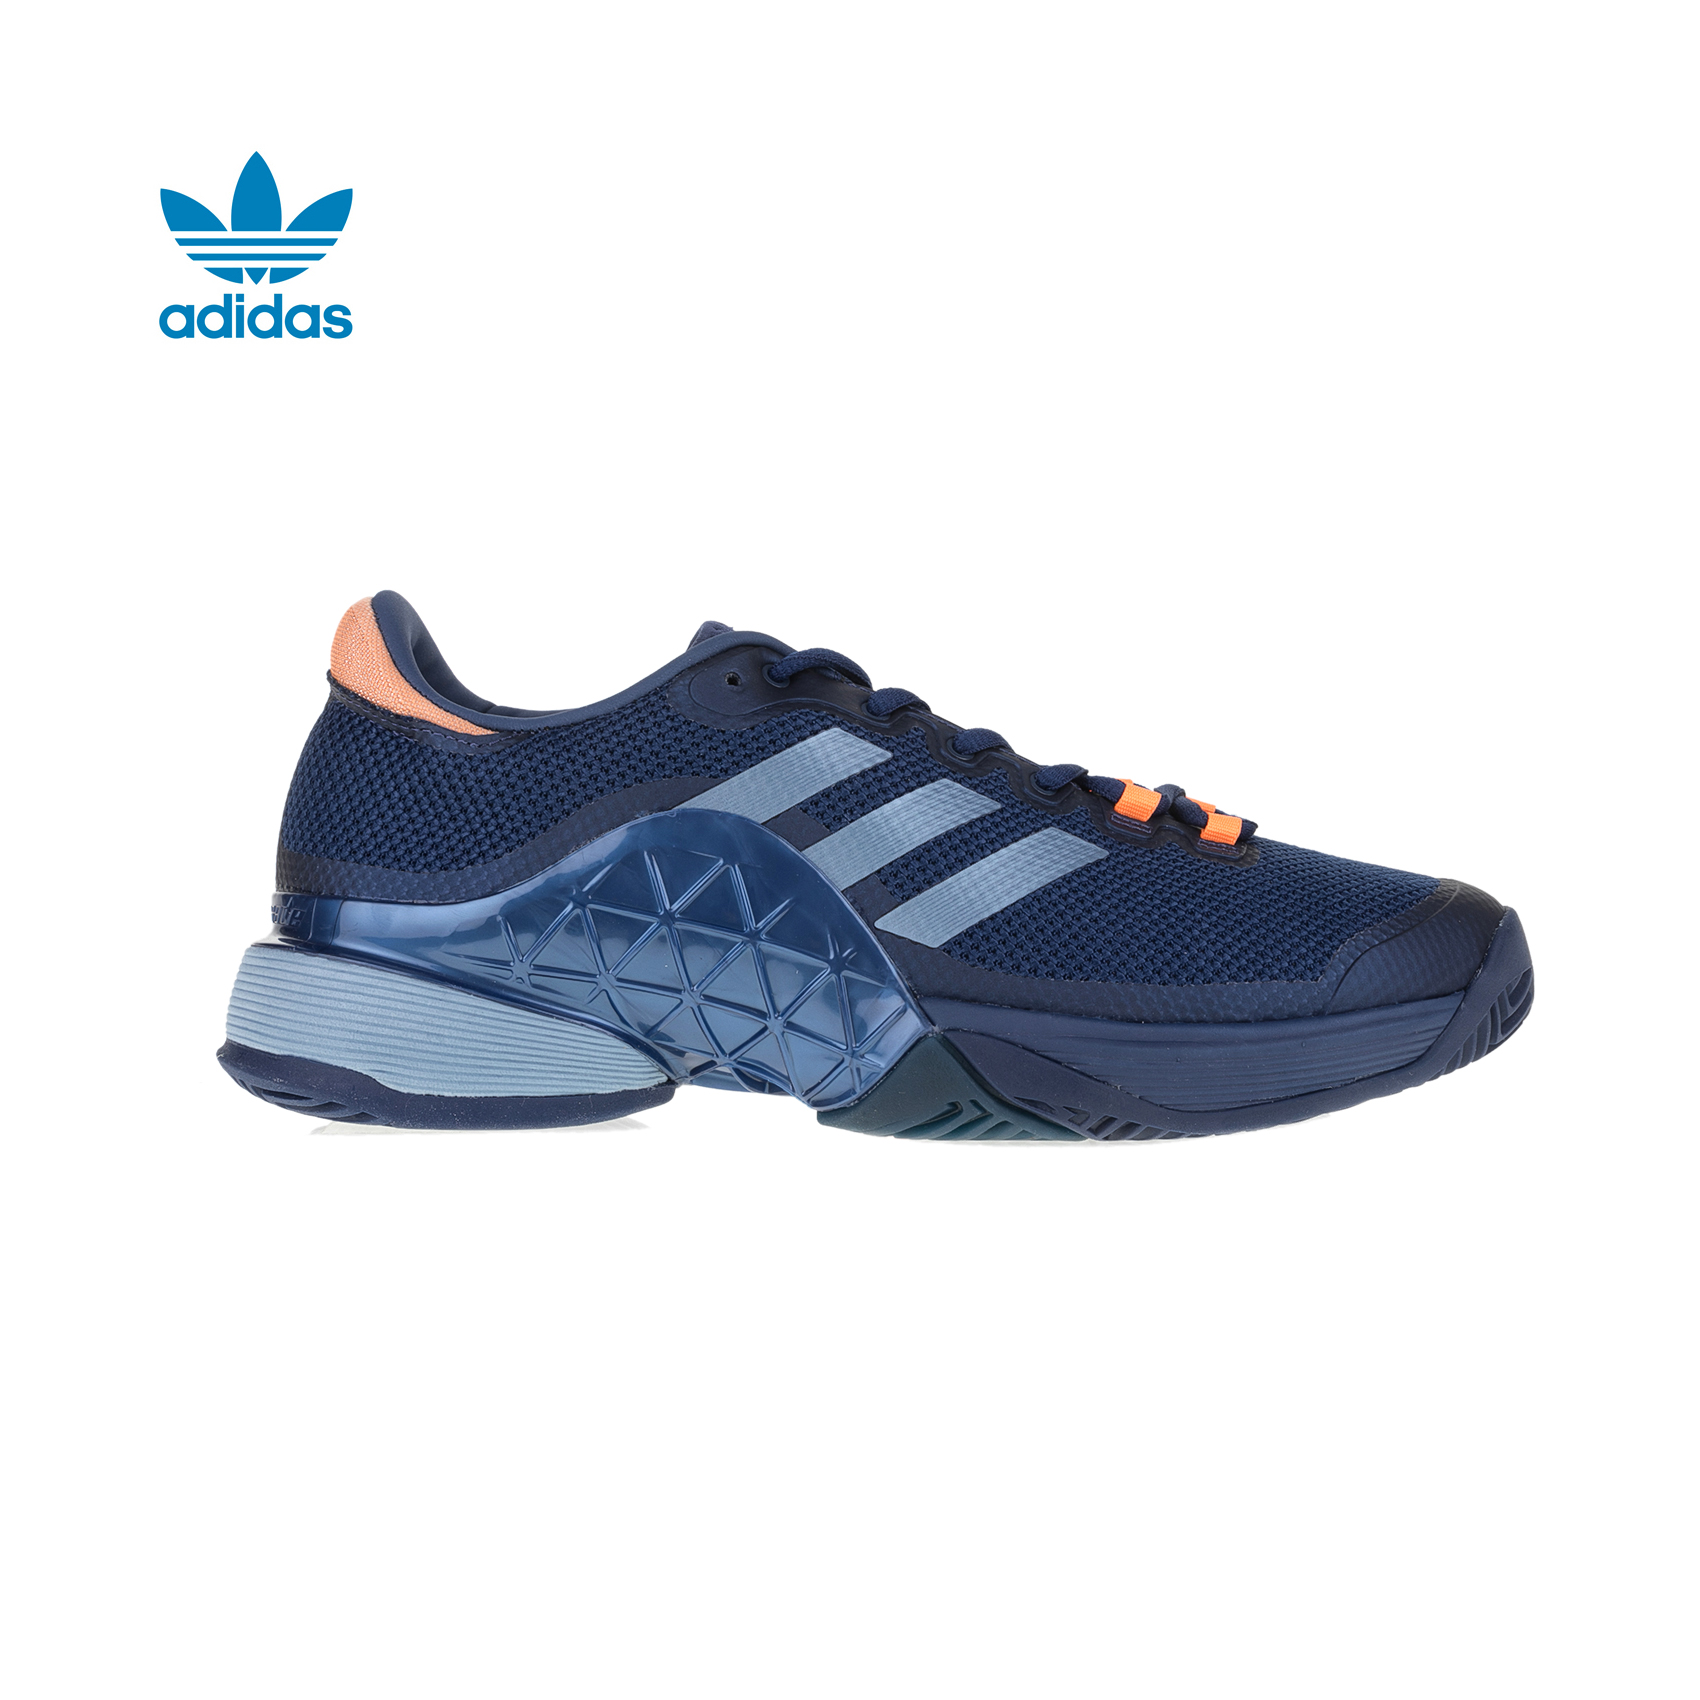 adidas Originals – Ανδρικά παπούτσια τένις adidas Barricade 2017 μπλε